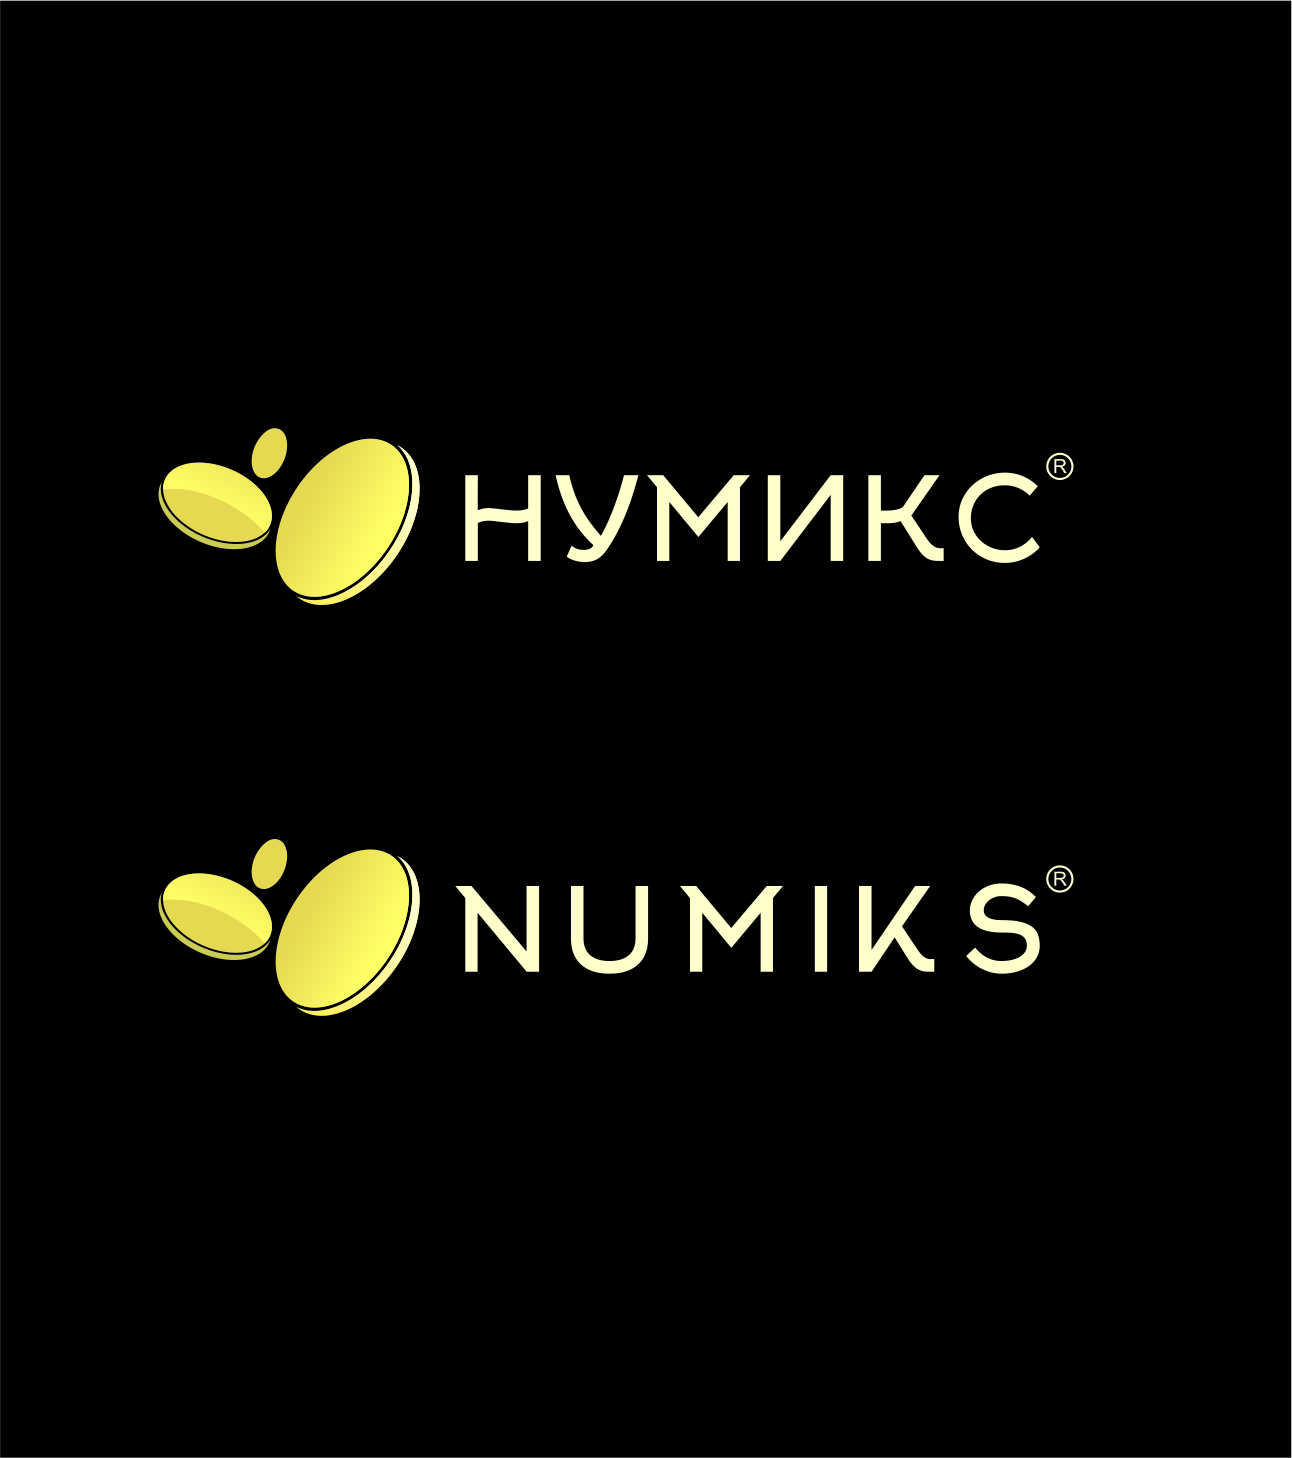 Логотип для интернет-магазина фото f_3915ecadc1150dc0.jpg